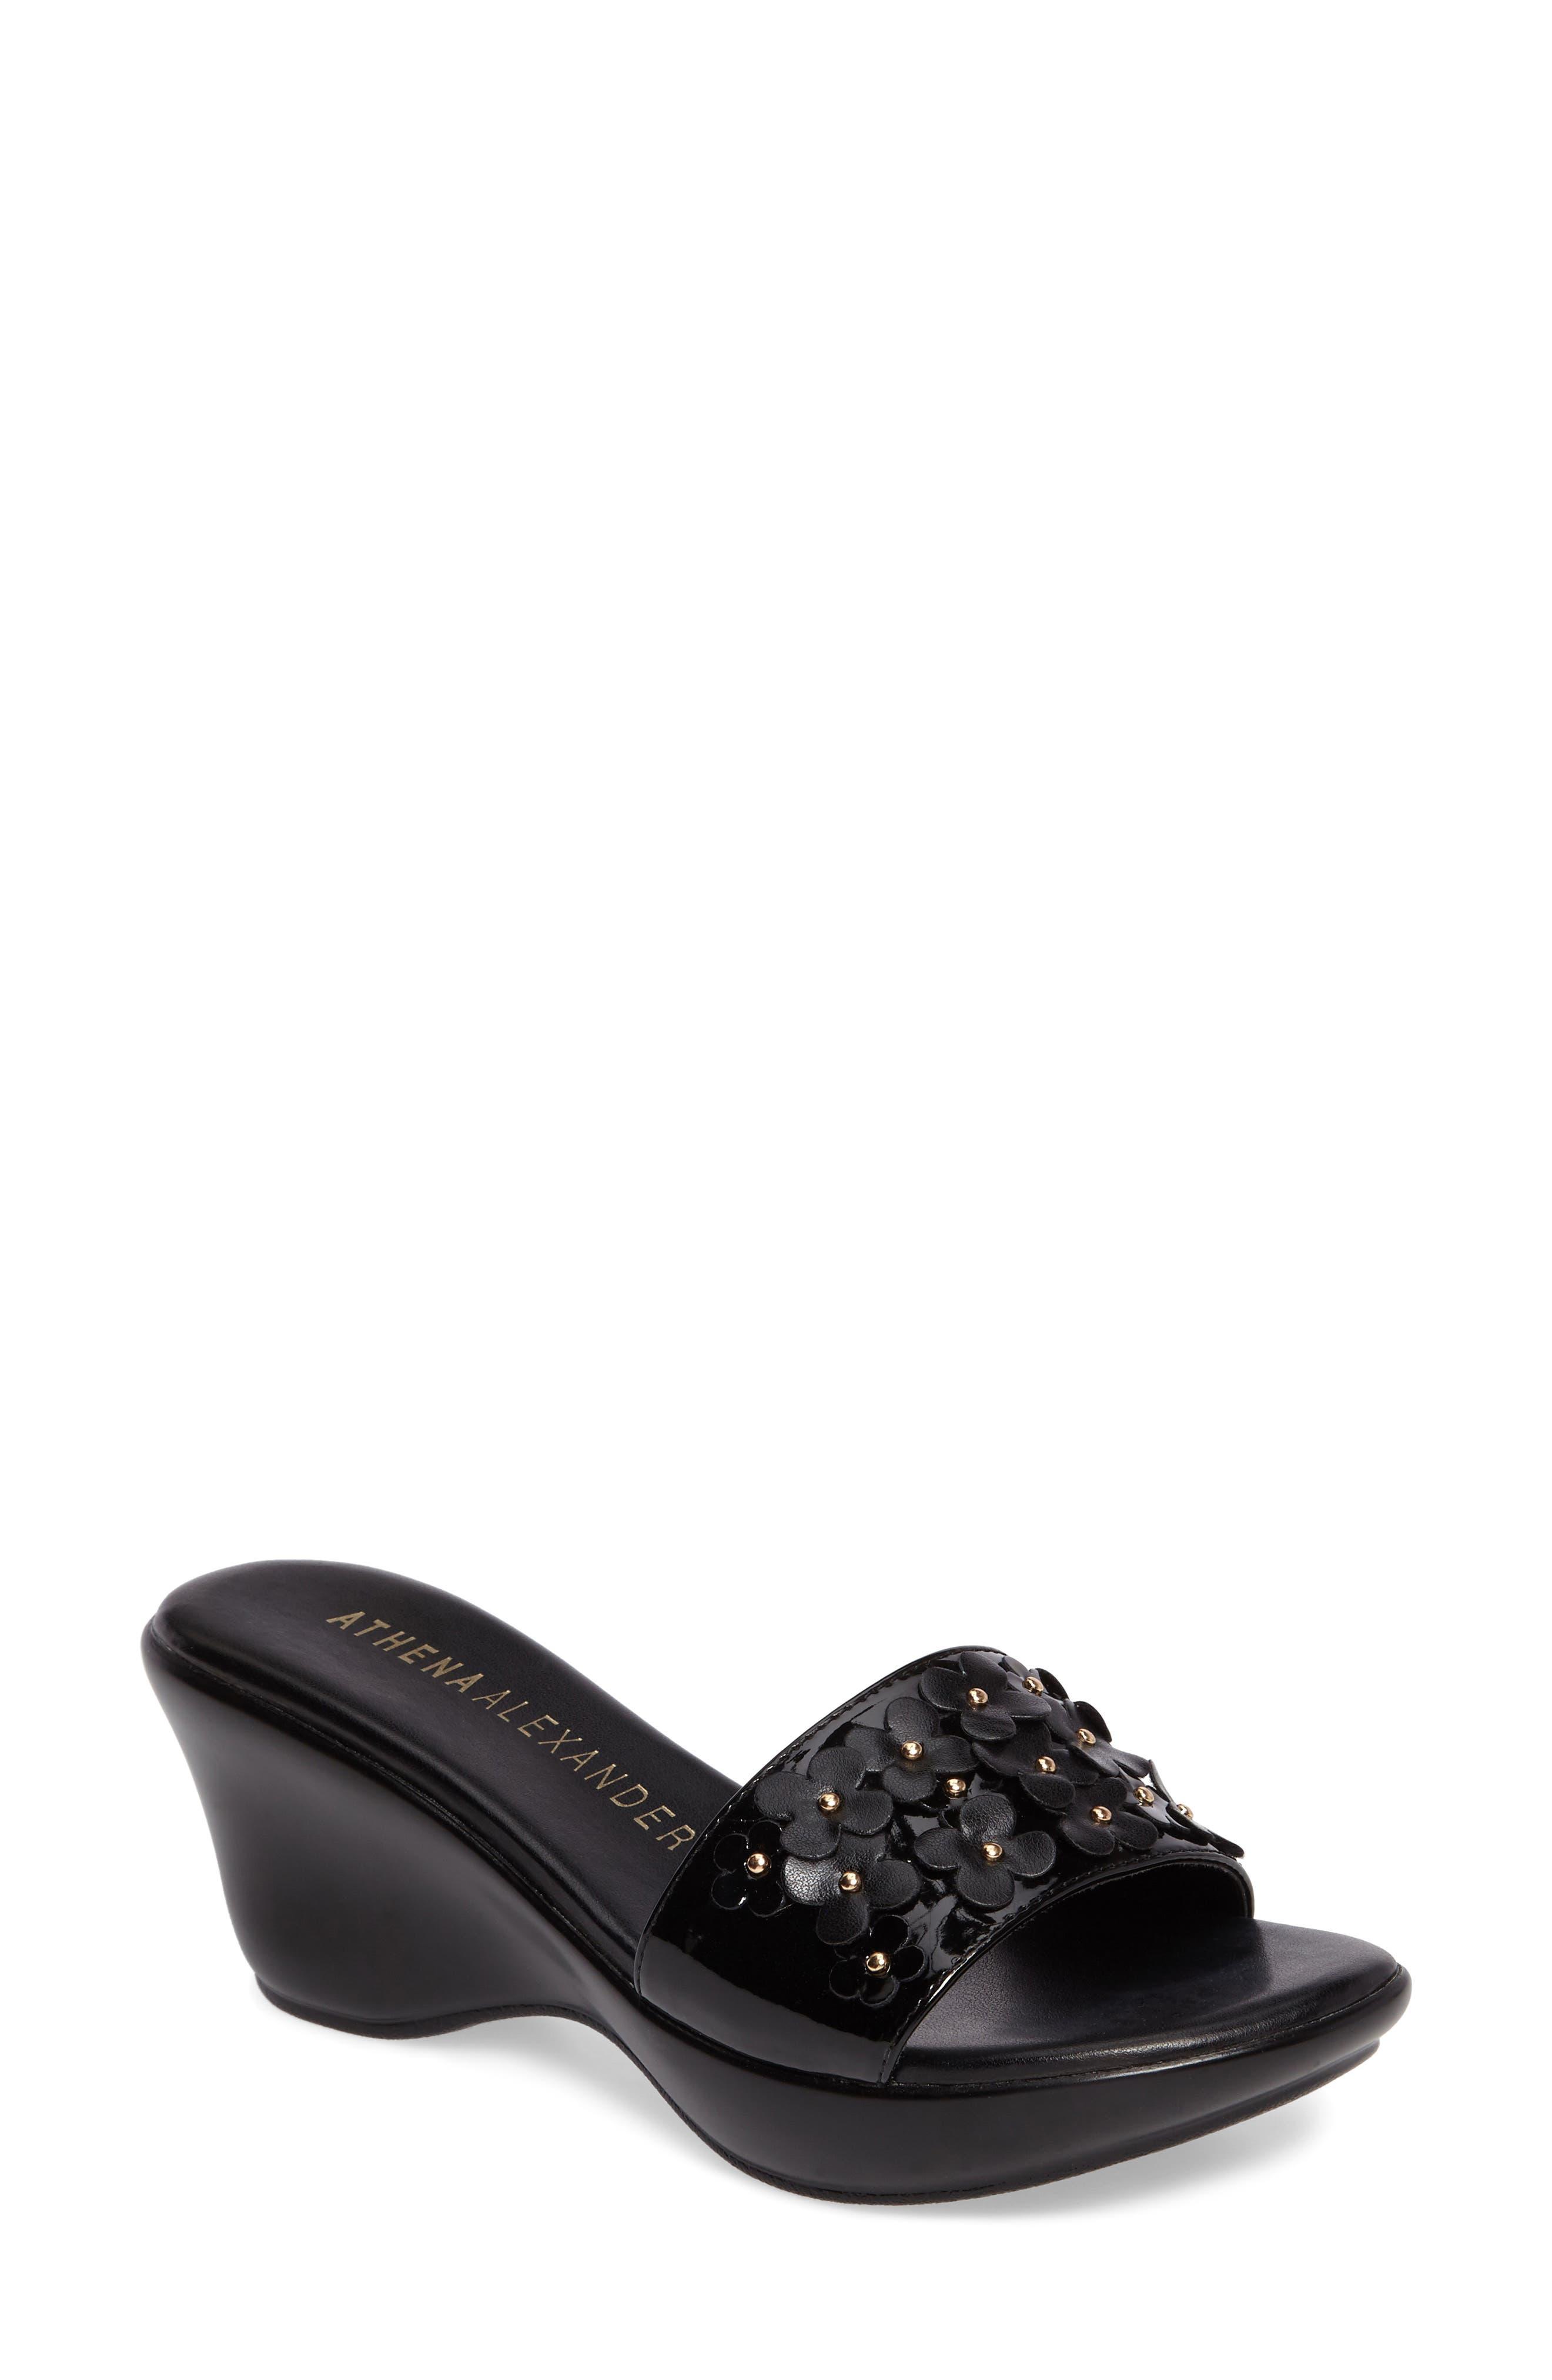 Allegra Wedge Slide,                         Main,                         color, Black Faux Leather